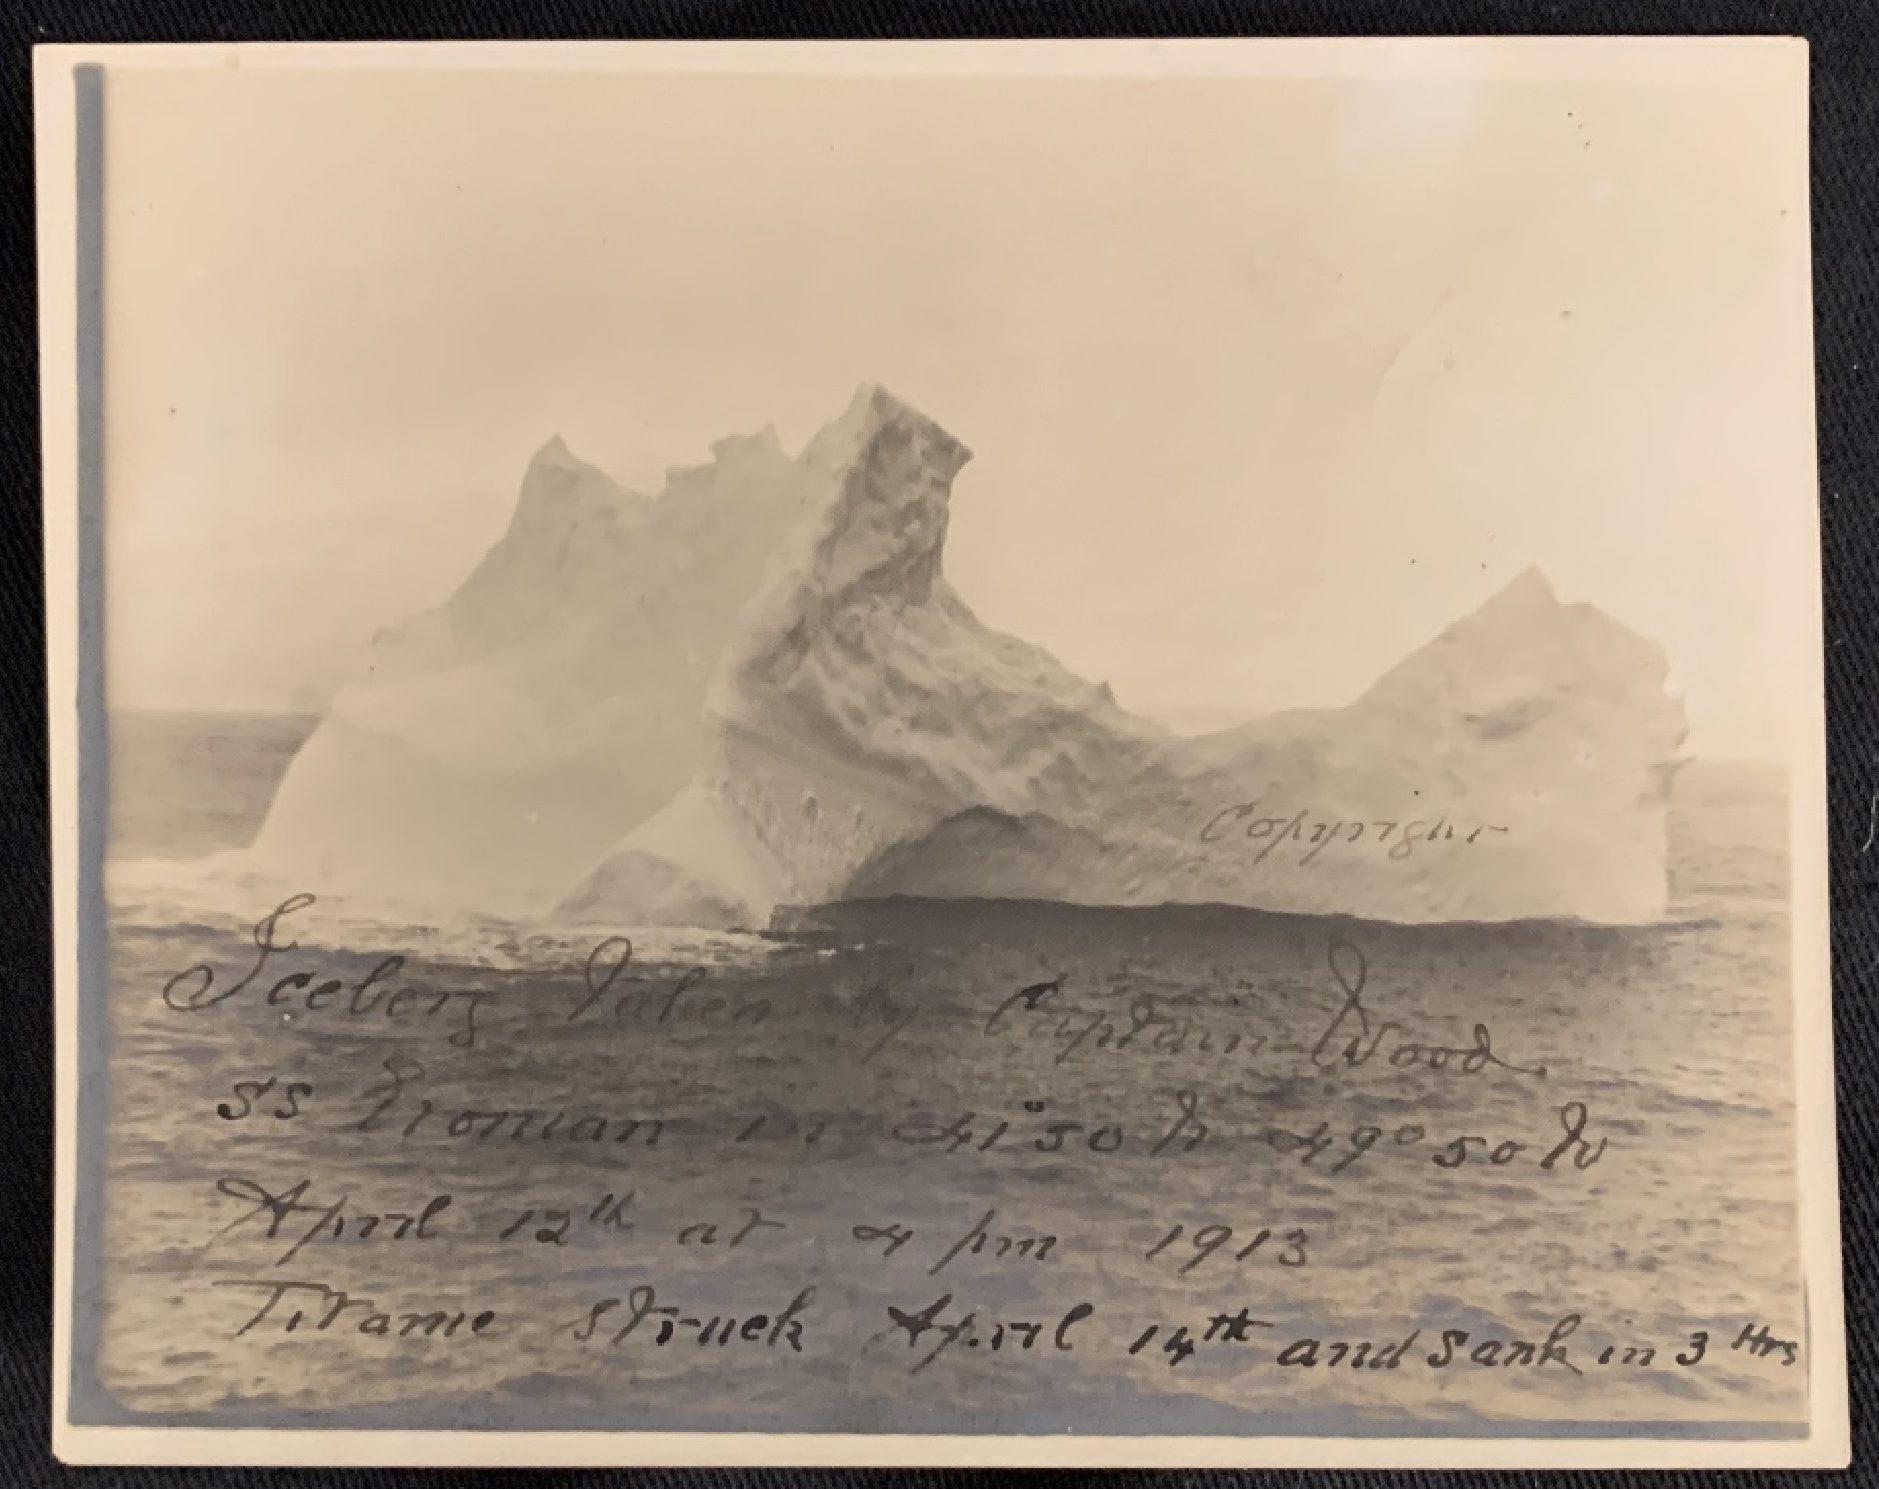 iceberg taken by captain wood ss etonian in 41°50n 49°50w april 12th at 4pm 1913 sic e1593107314134